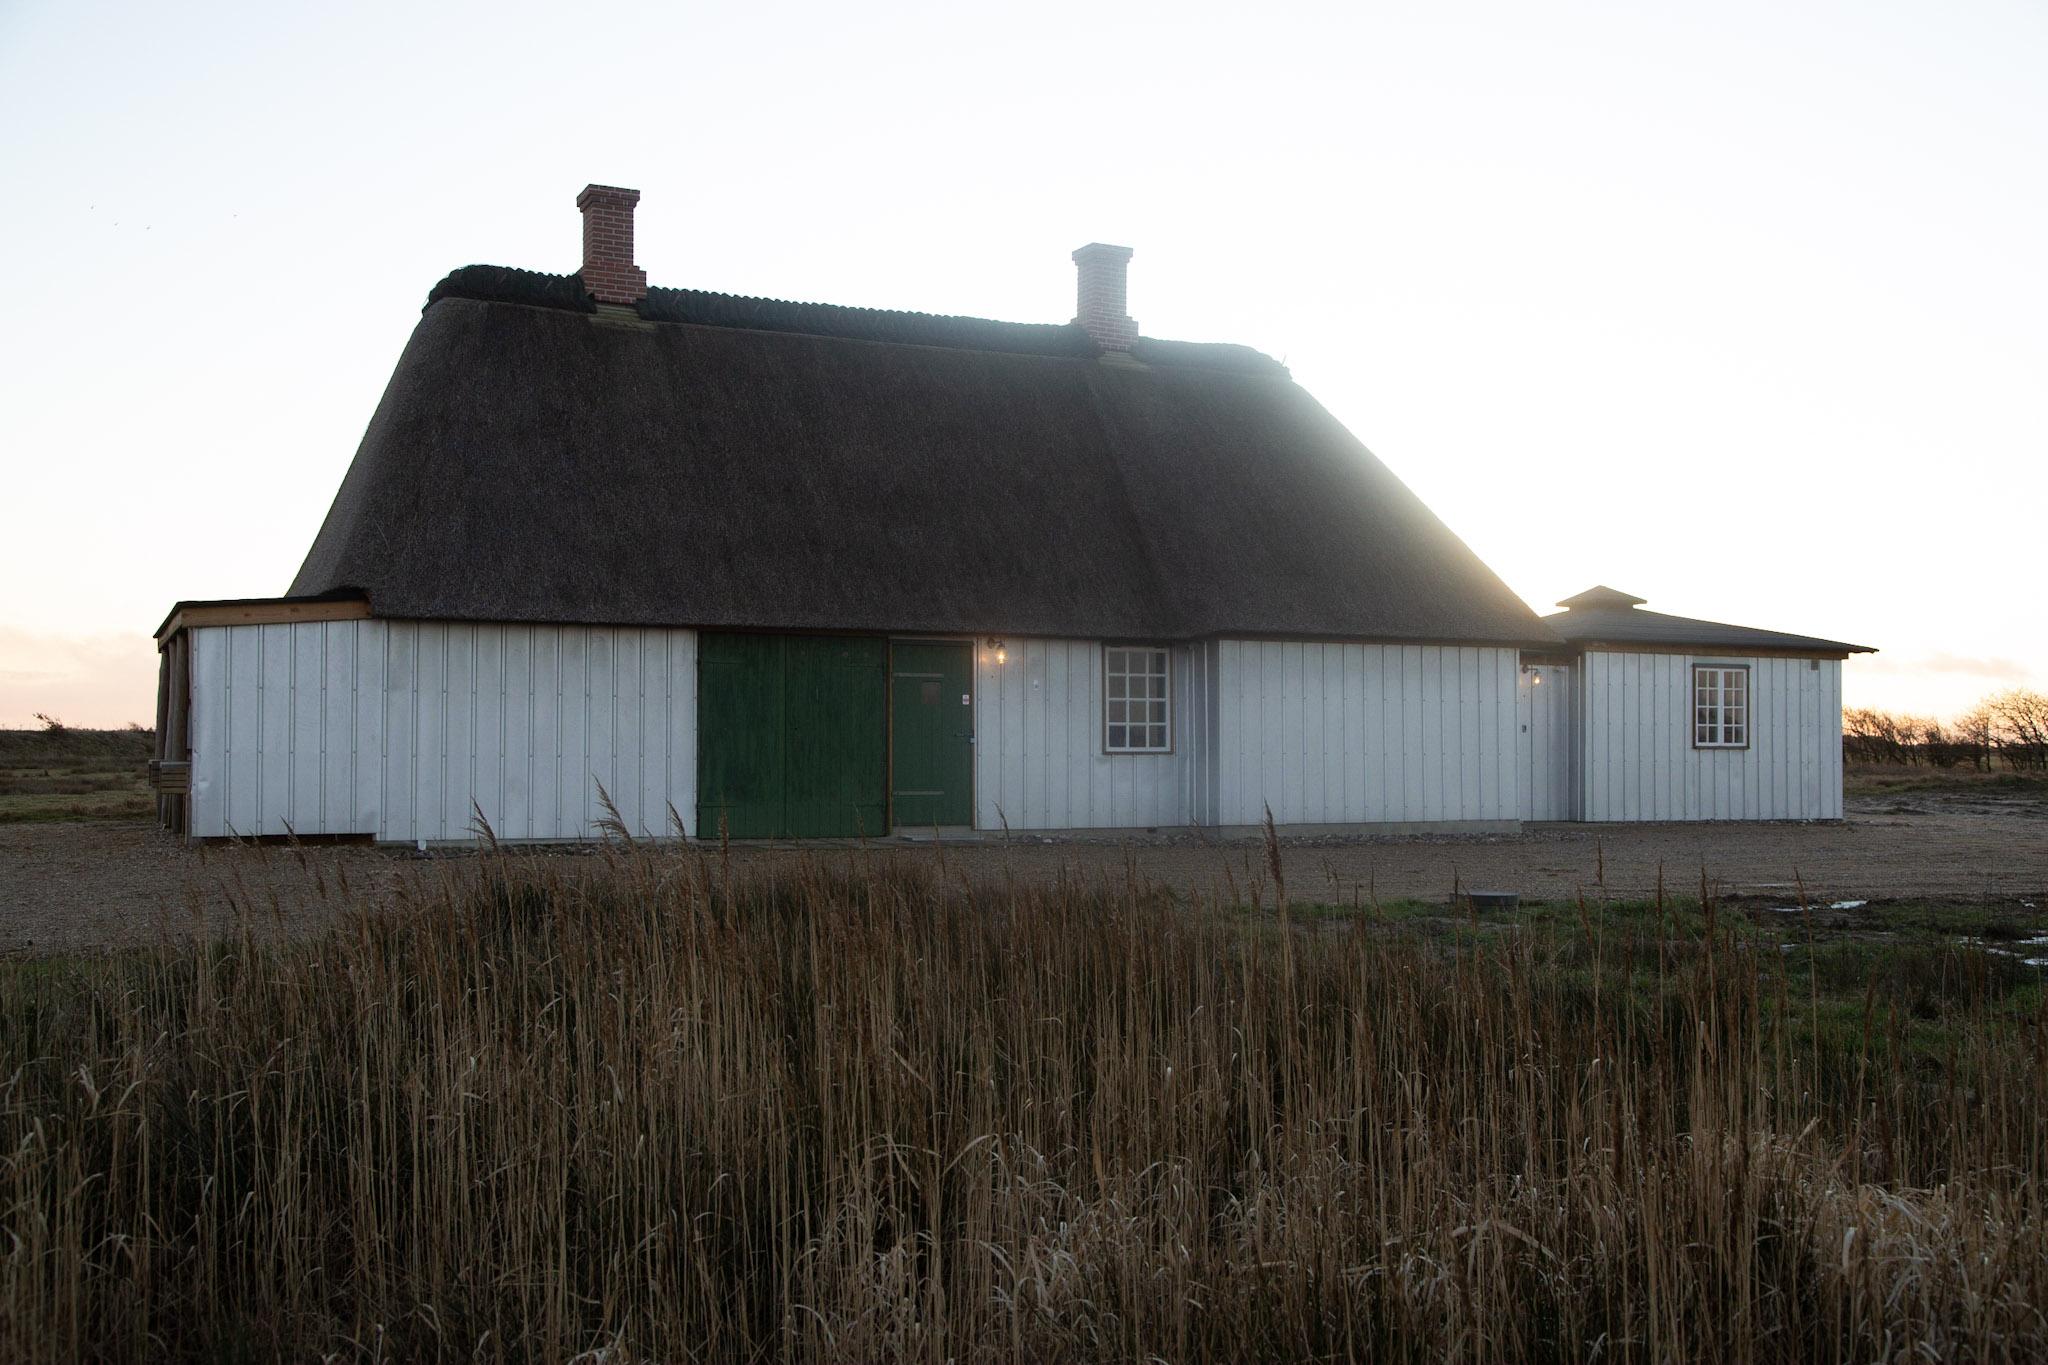 Provstgaards Hus